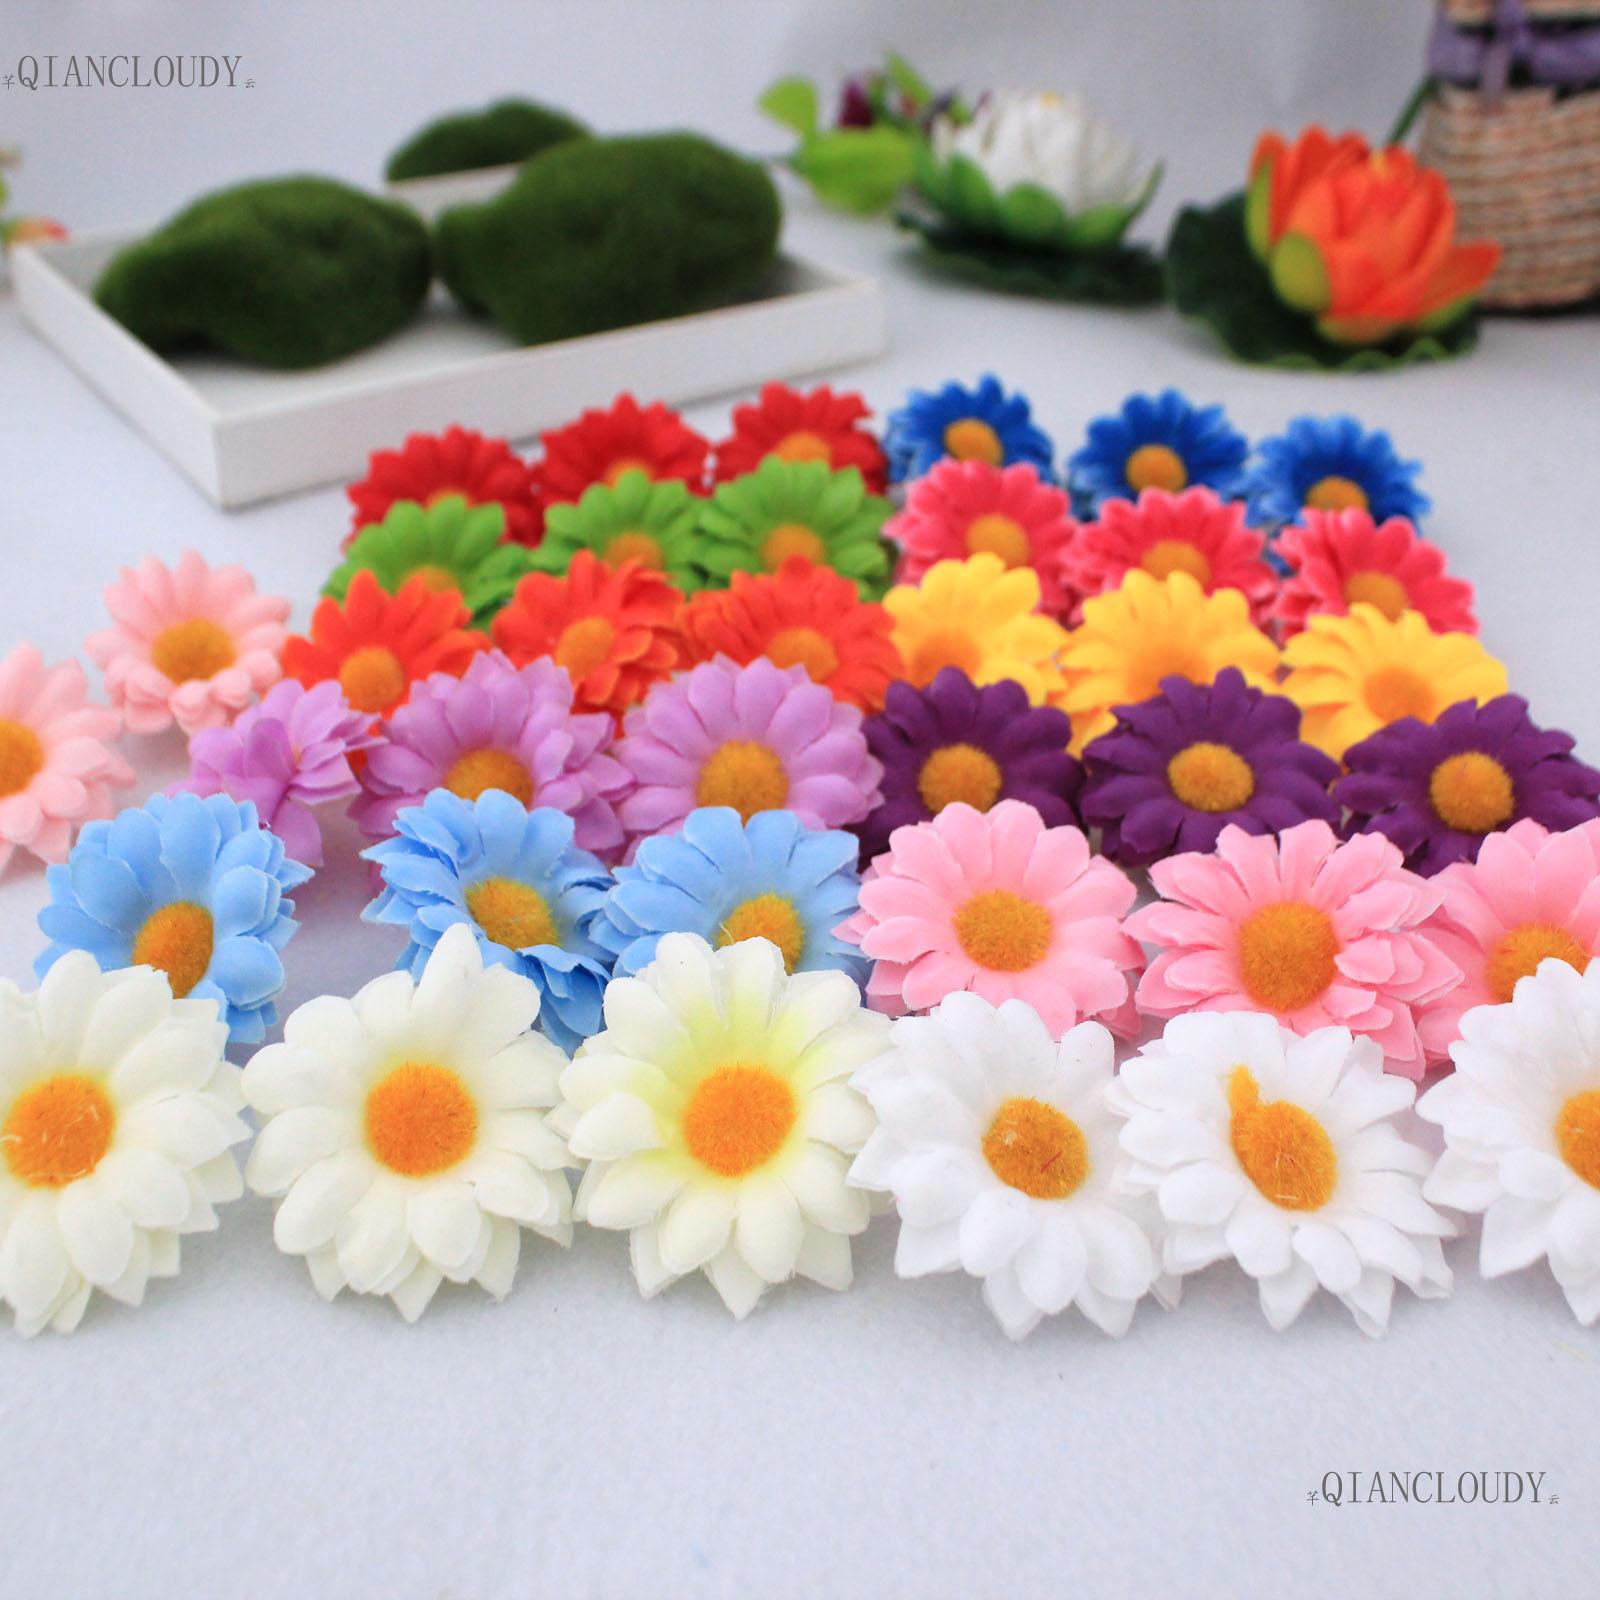 100 unidades 5cm, Gerbera, Margarita, seda Artificial, cabezas de flores, girasol, pinza para el pelo, Bola de decoración para bodas, flores artesanales falsas A25